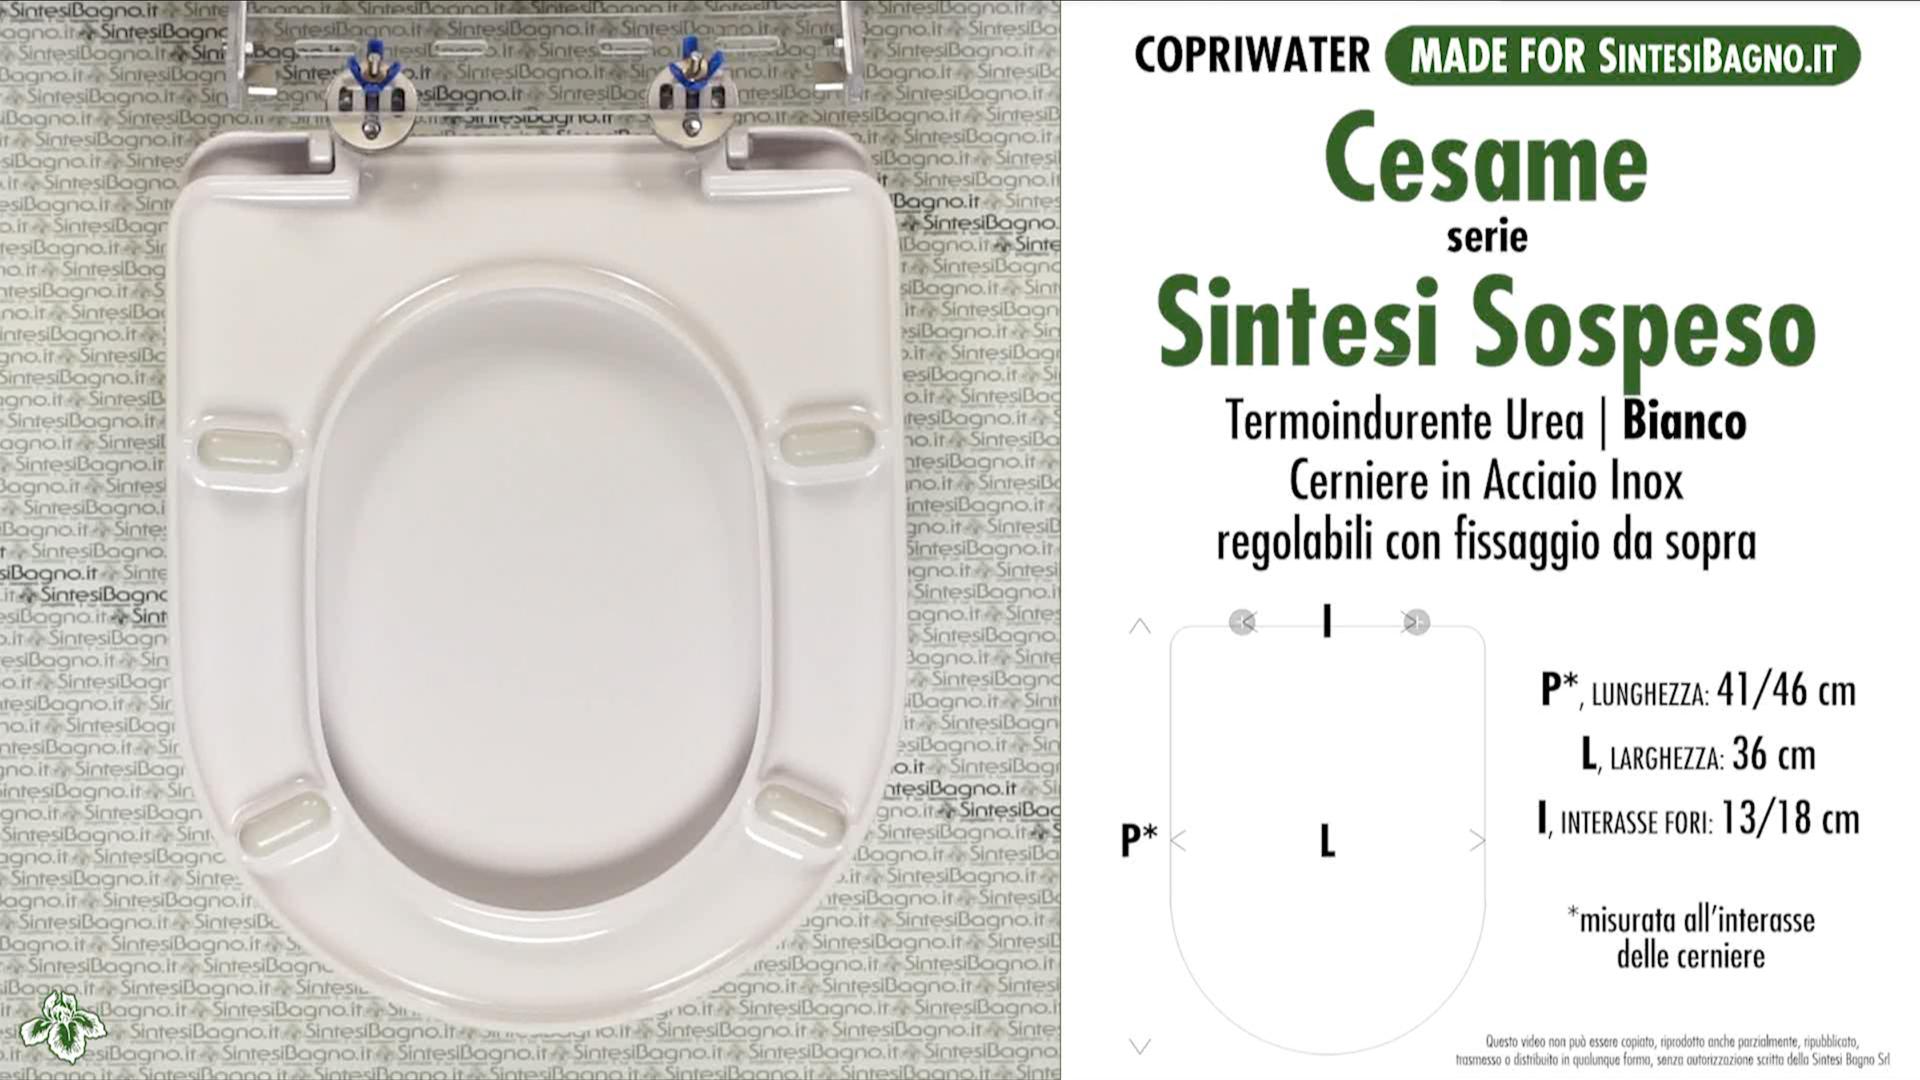 SCHEDA TECNICA MISURE copriwater CESAME SINTESI SOSPESO